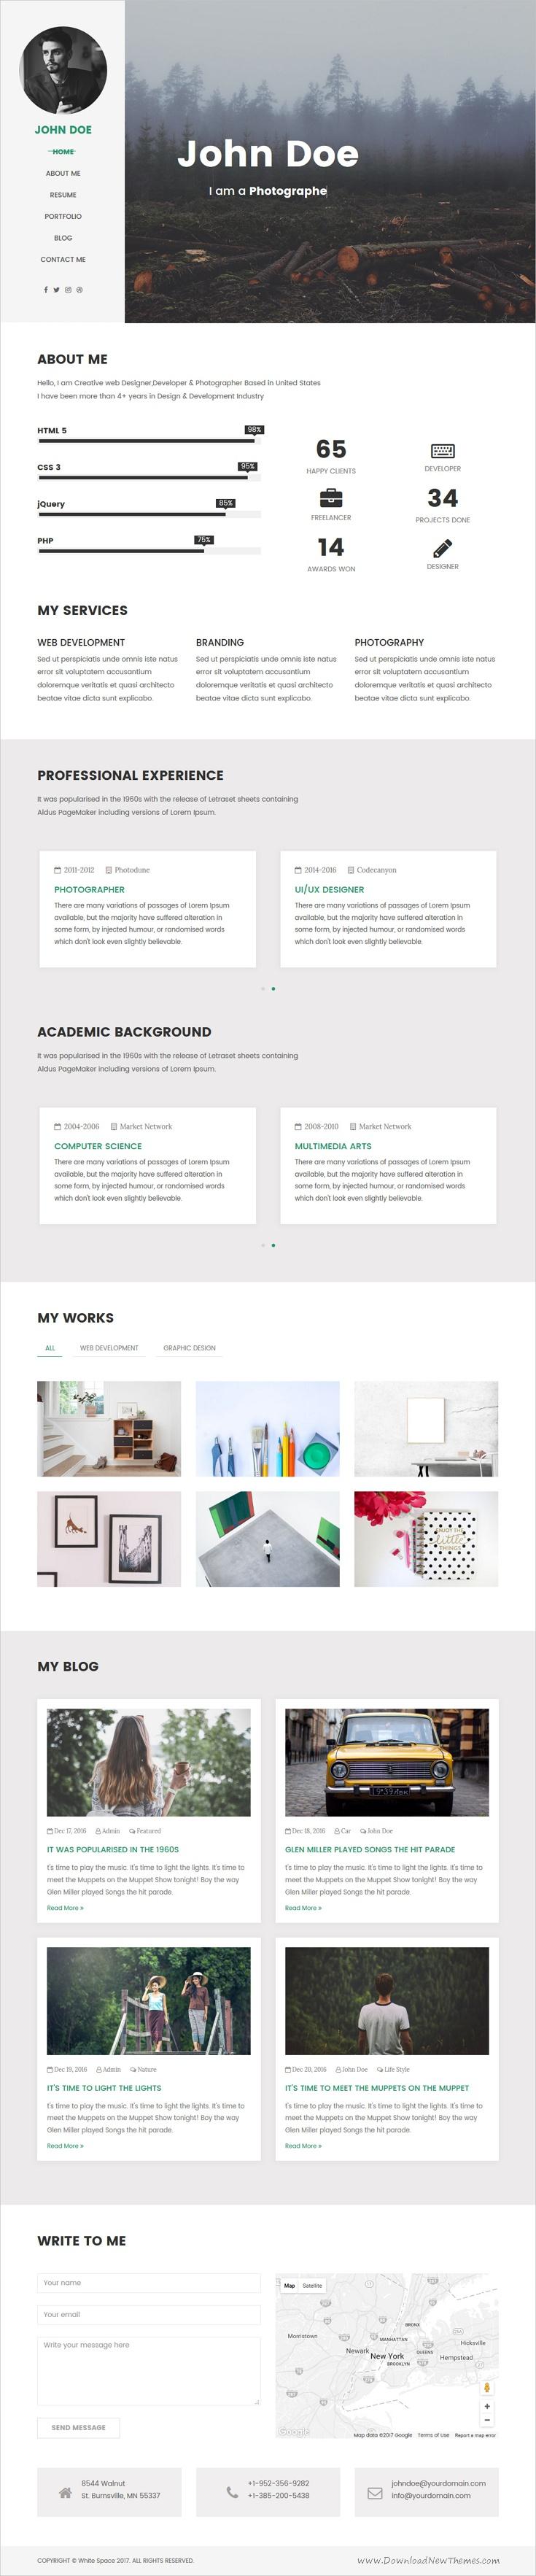 White Space Personal Portfolio  Resume Template  Personal